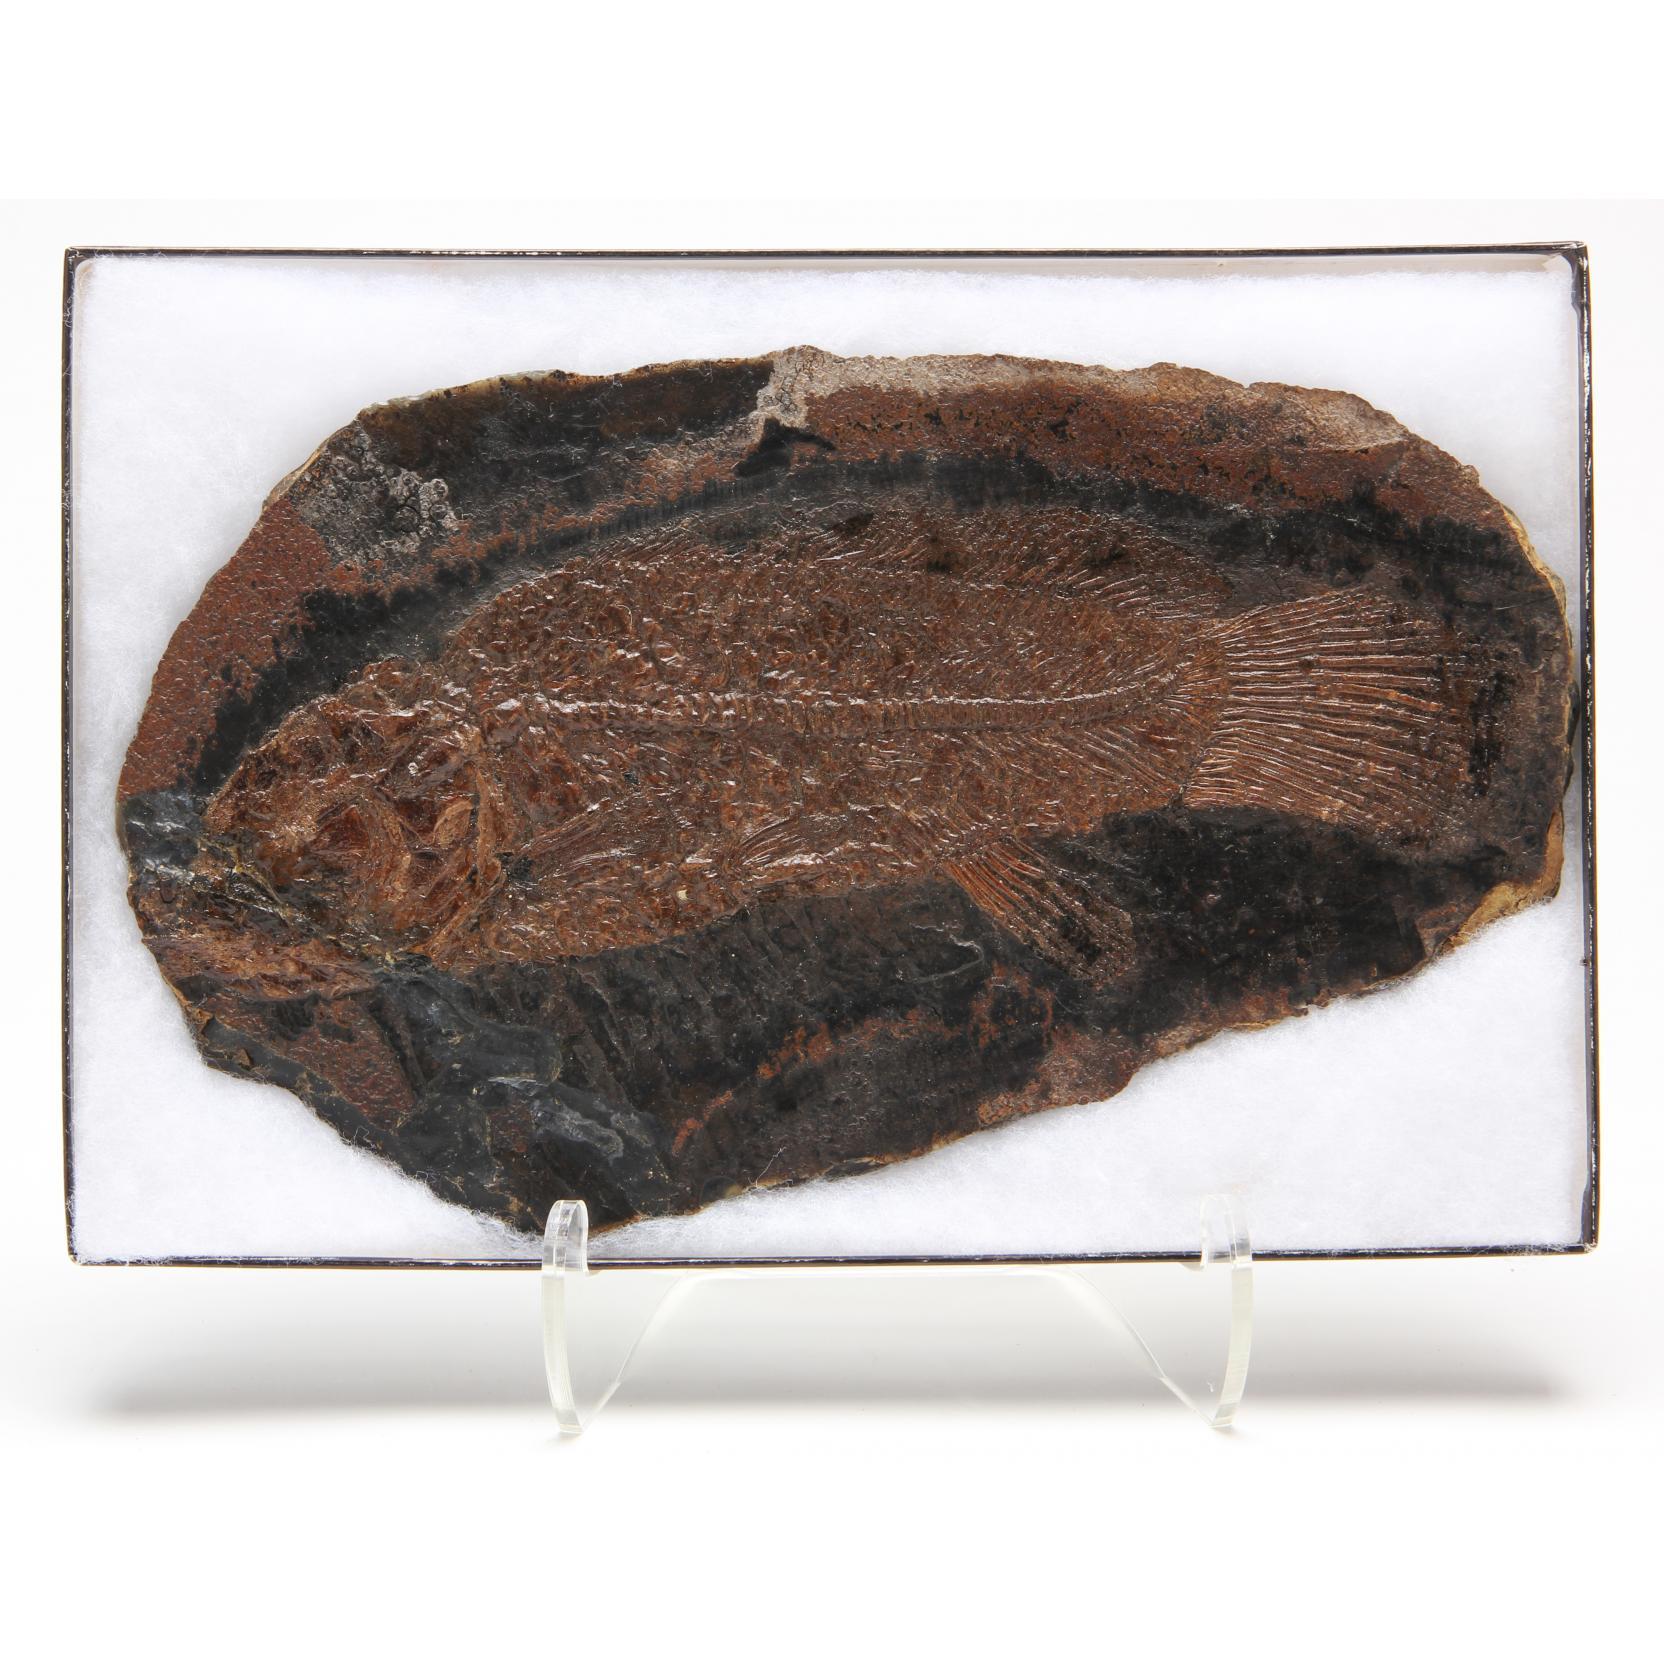 fossil-fish-i-amia-kehreri-i